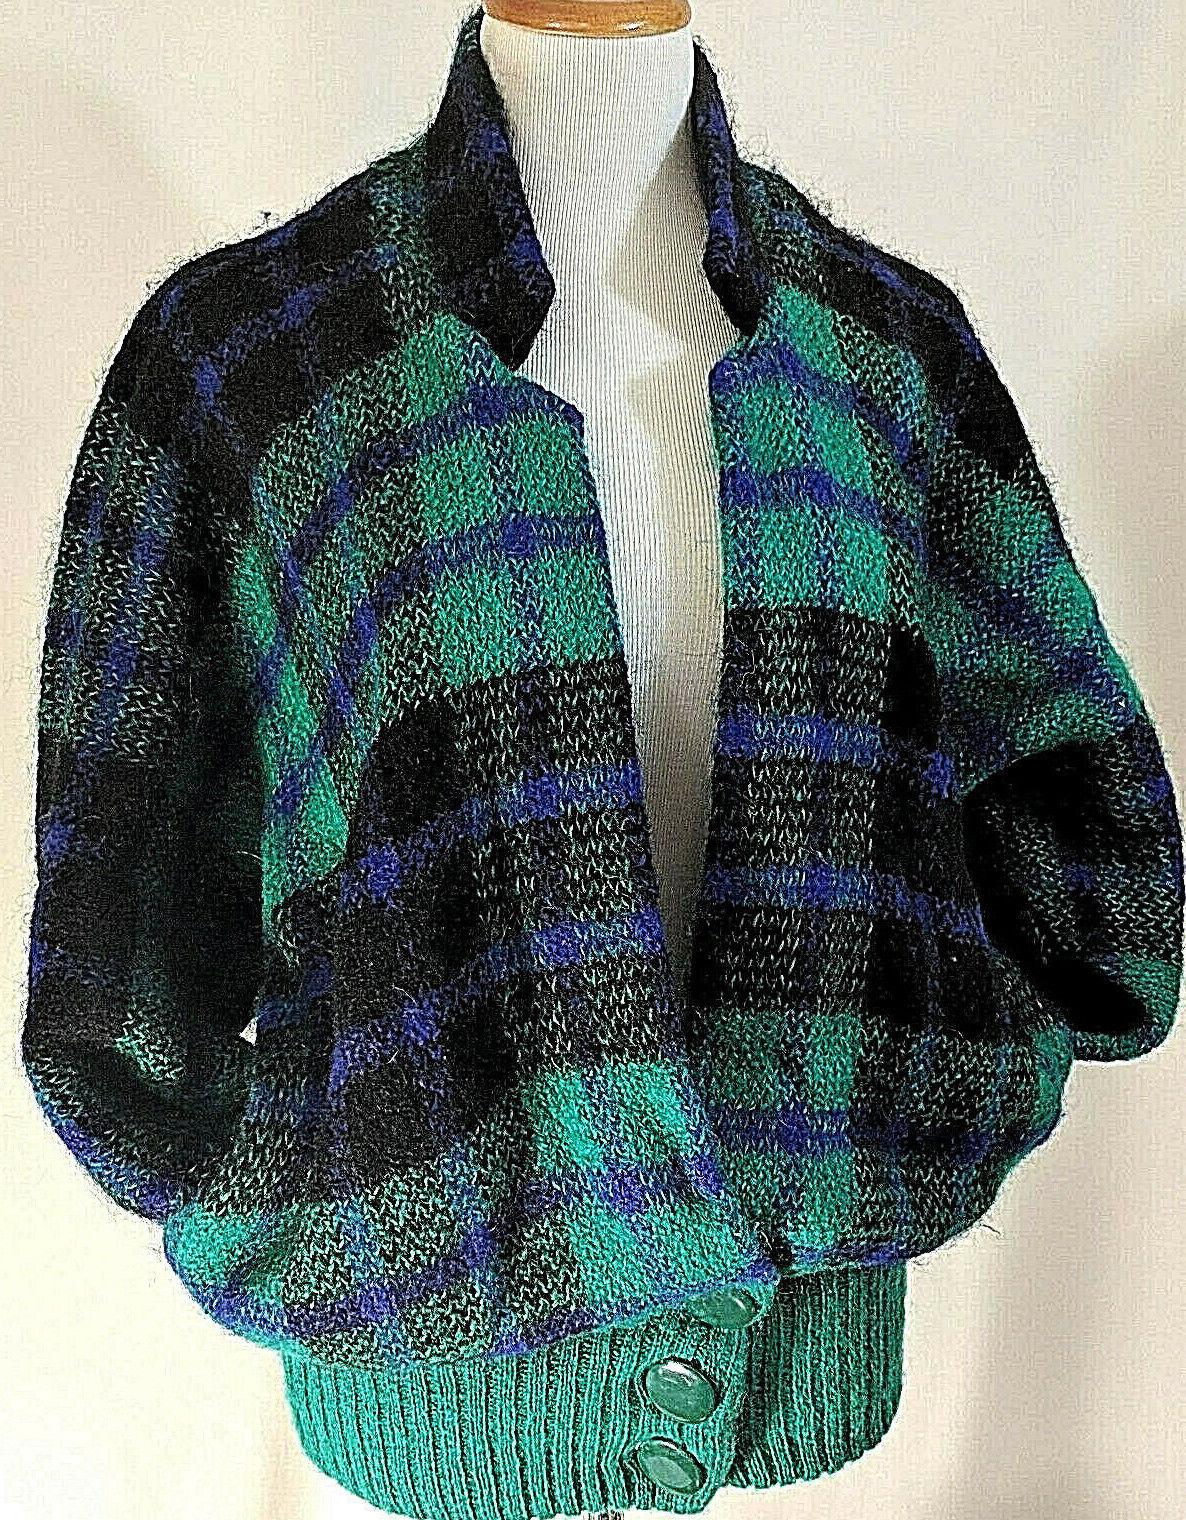 Vintage IB Diffusion Sweater Mohair Blend Plaid 1980s 90s Size M